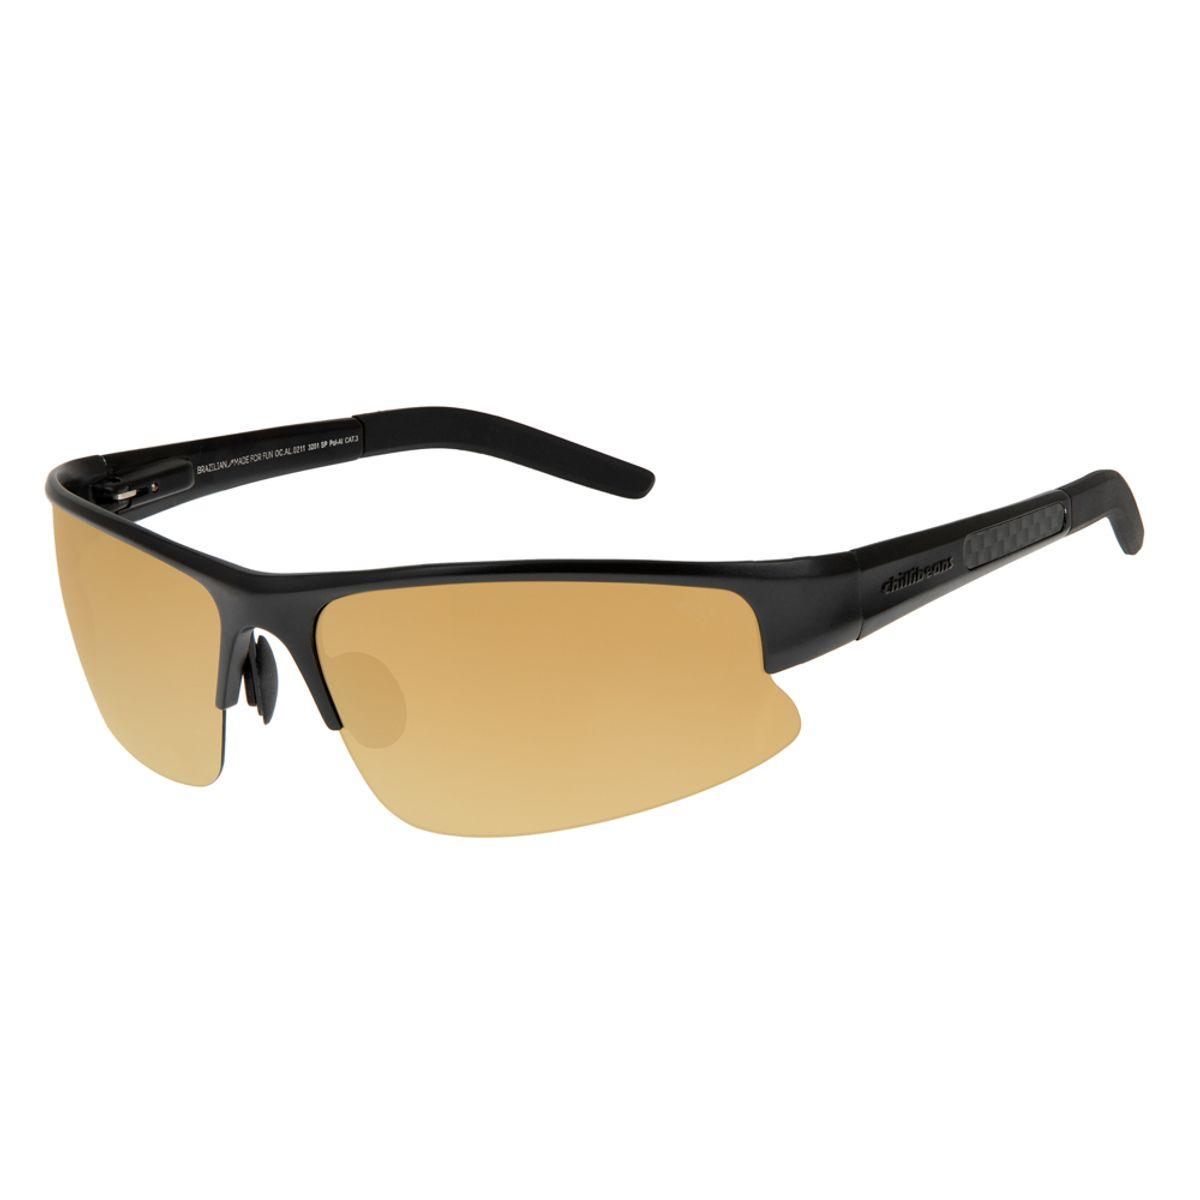 c05e5546054ae Óculos de Sol Chilli Beans Esportivo Masculino Polarizado Espelhado ...